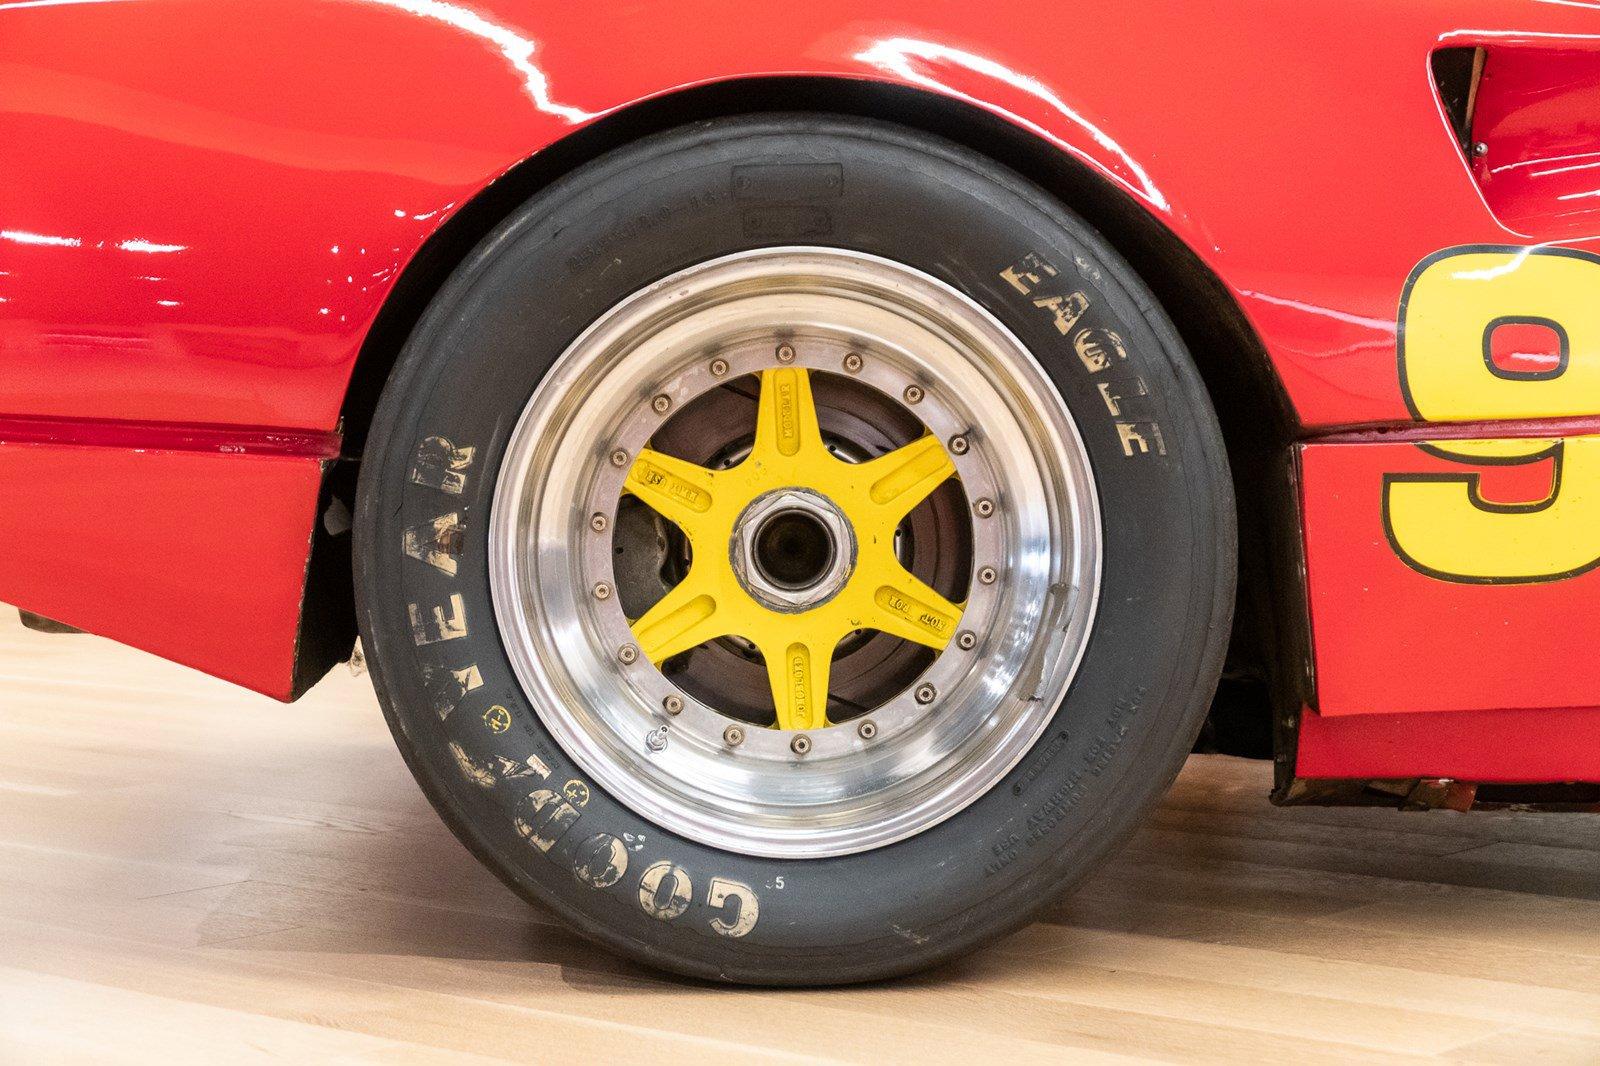 Pre-Owned 1976 Ferrari 308 GT2 Race Car